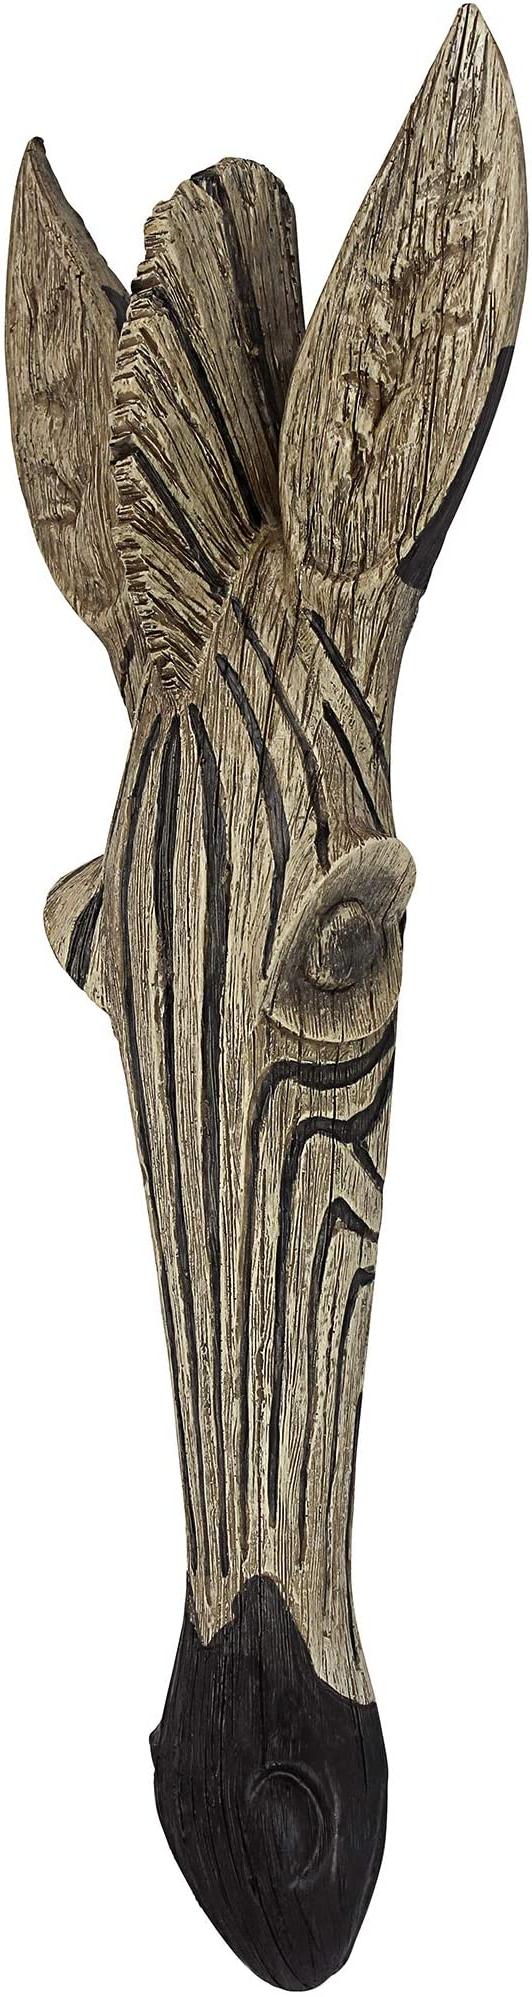 Newest Animal Mask Of The Savannah Zebra Wall Décor With Máscara De Desenho Toscano Animal Da Savannah Wall Sculpture (View 19 of 20)